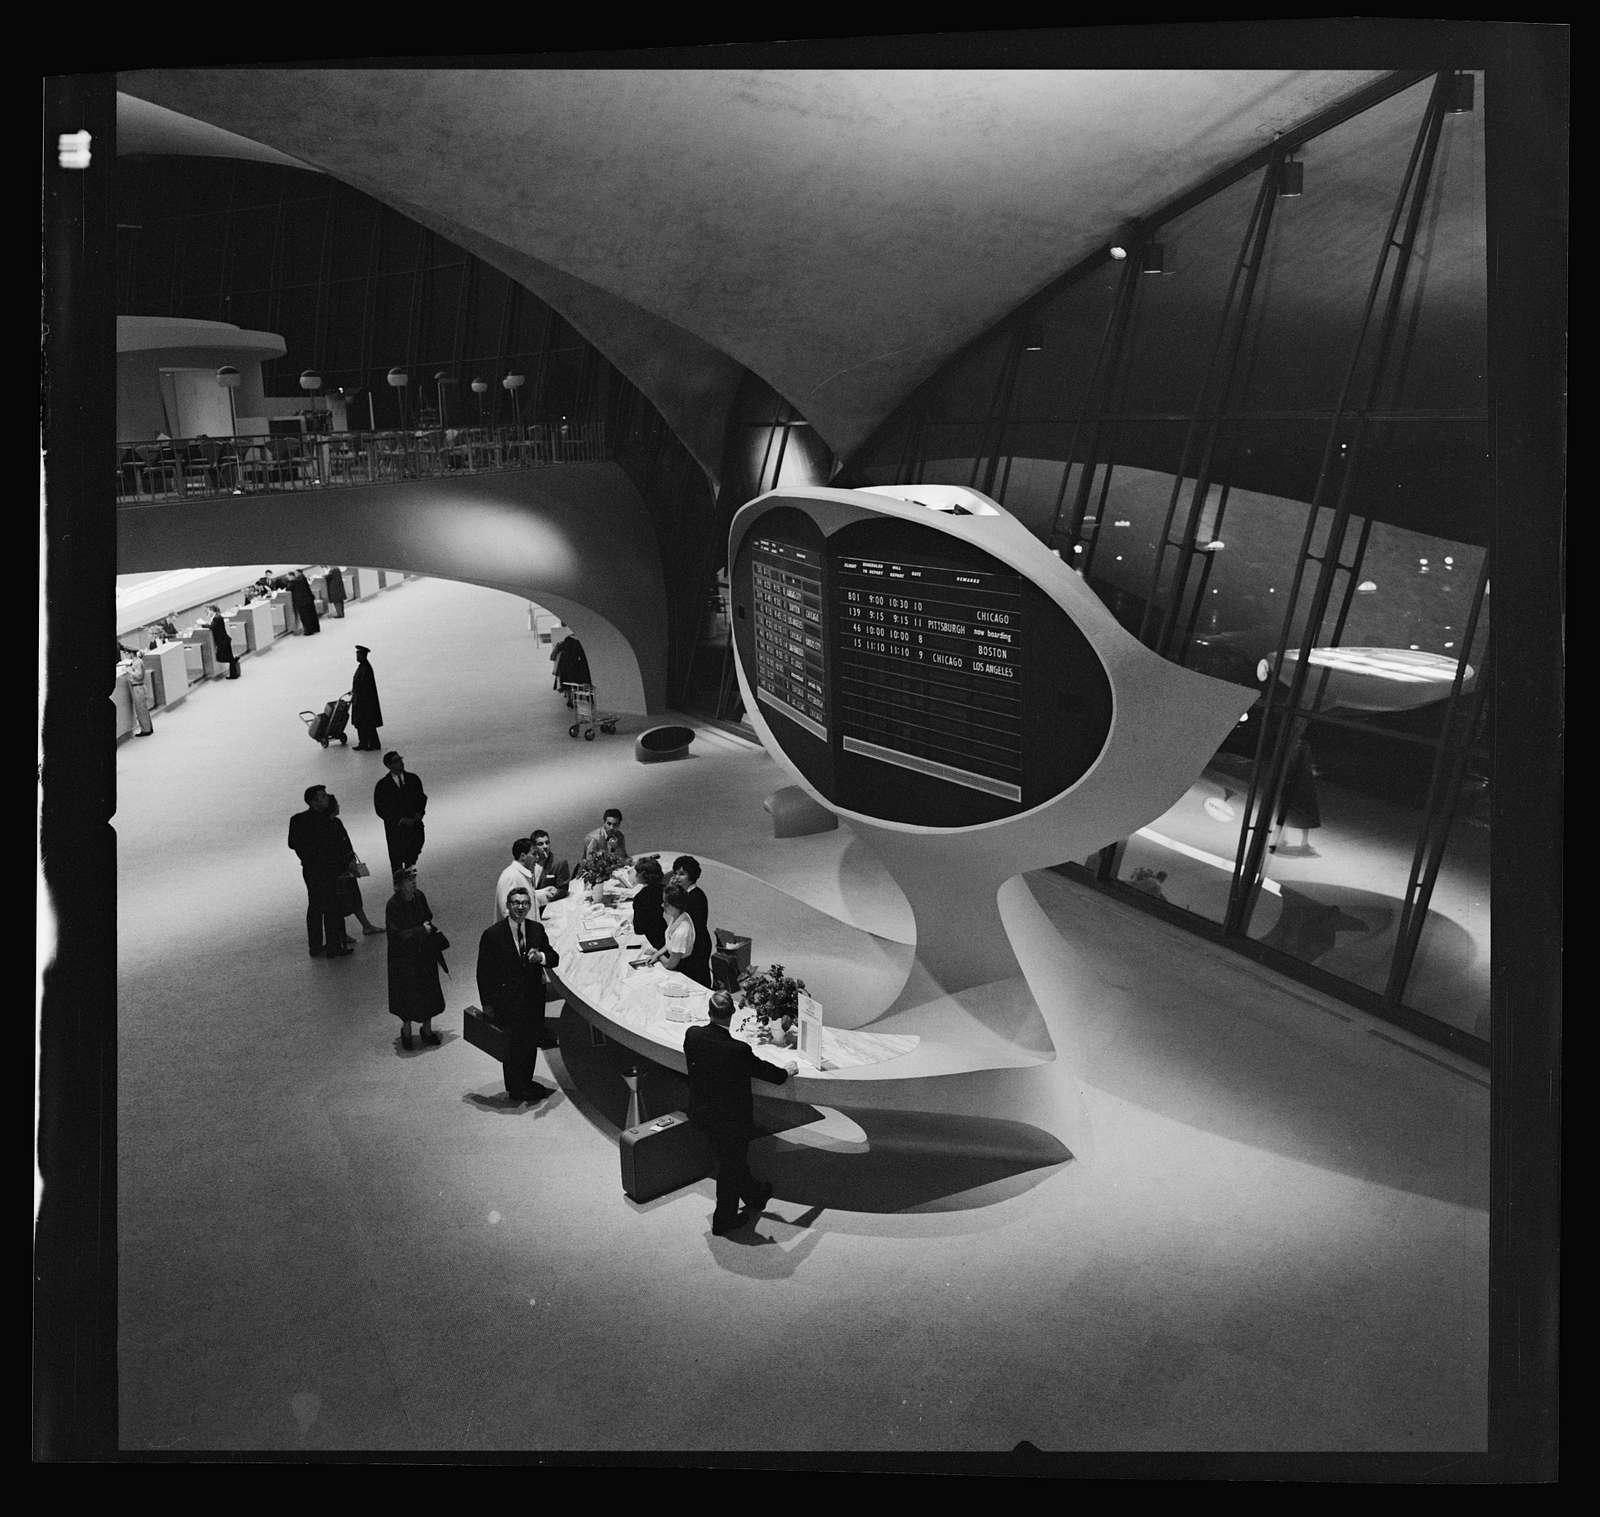 Trans World Airlines Terminal, John F. Kennedy (originally Idlewild) Airport, New York, New York, 1956-62. Information desk